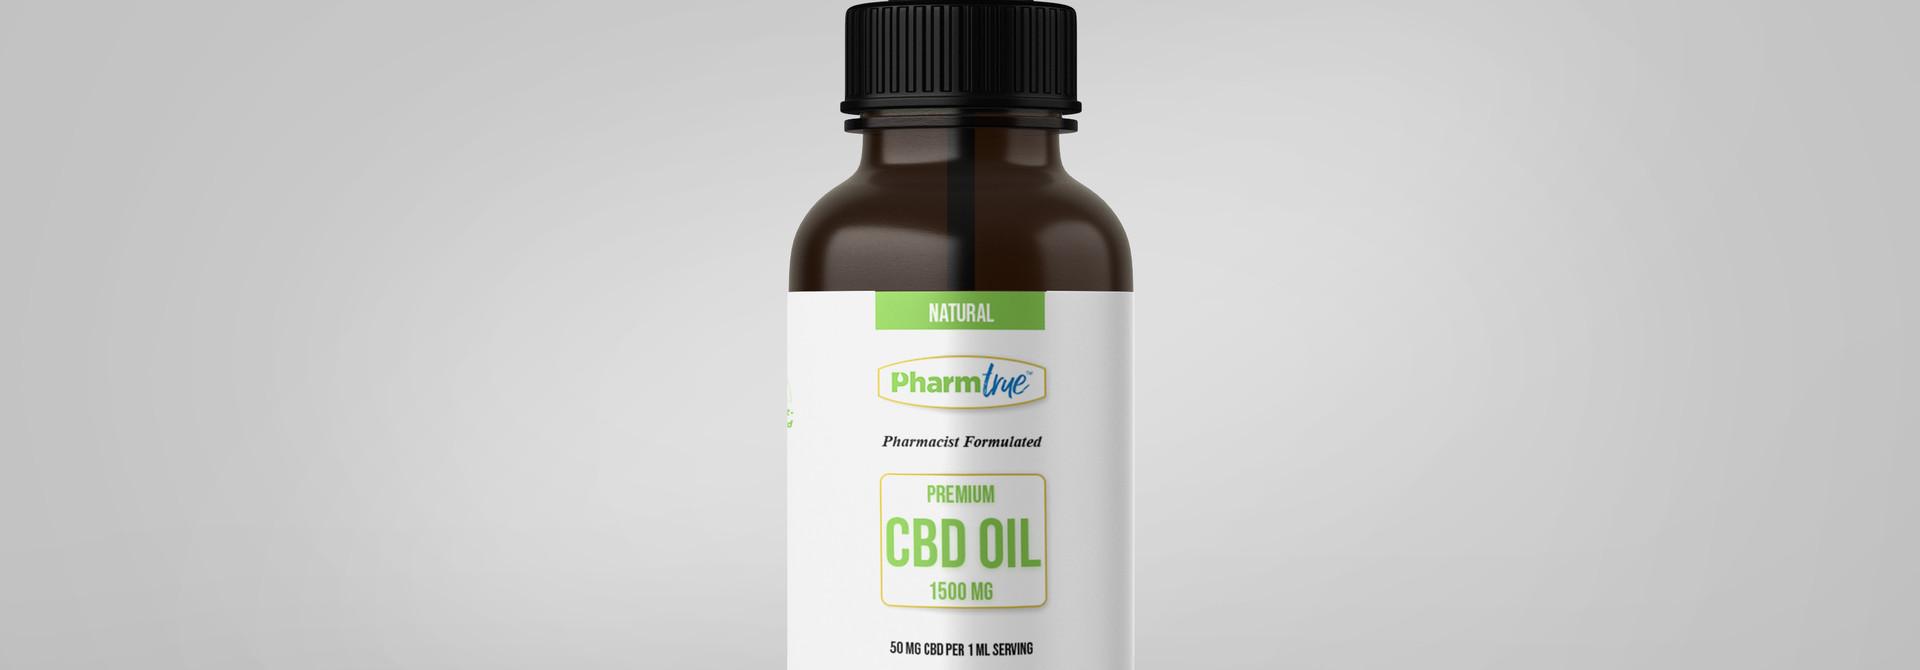 CBD OIL 1500 mg TINCTURE - Natural